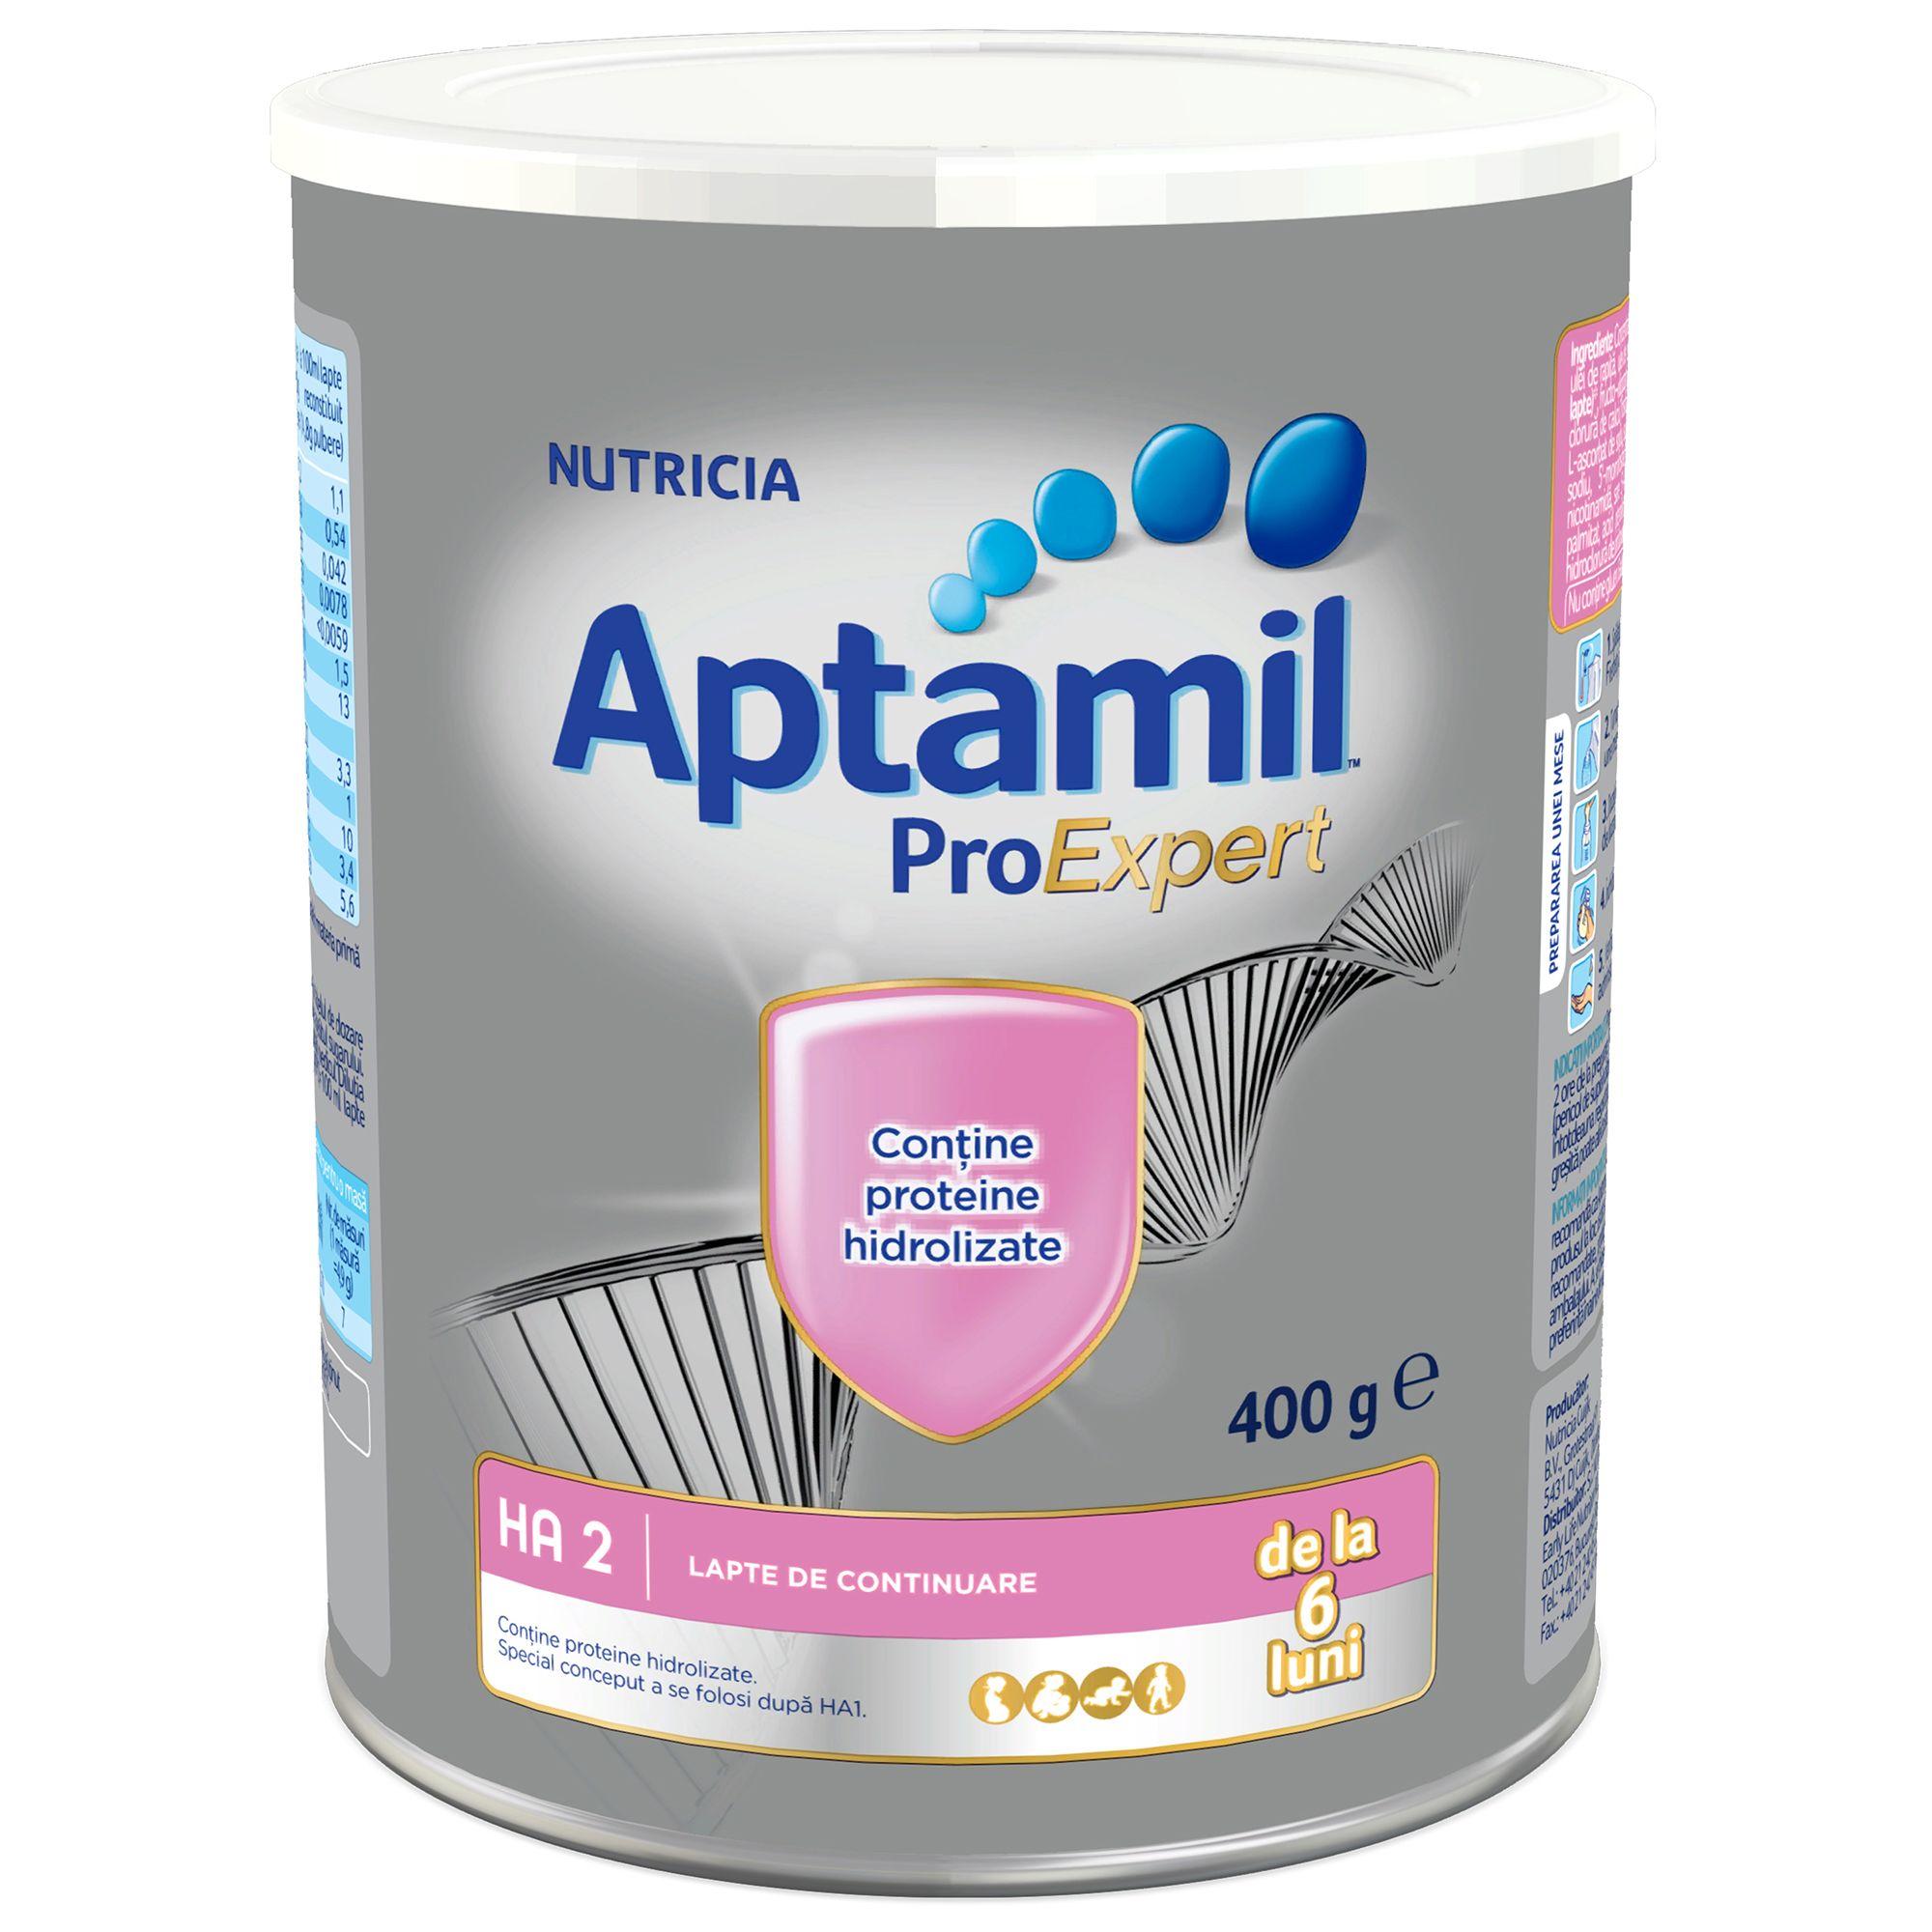 Lapte praf hipoalergenic Nutricia, Aptamil HA2, 400G, 6 luni+